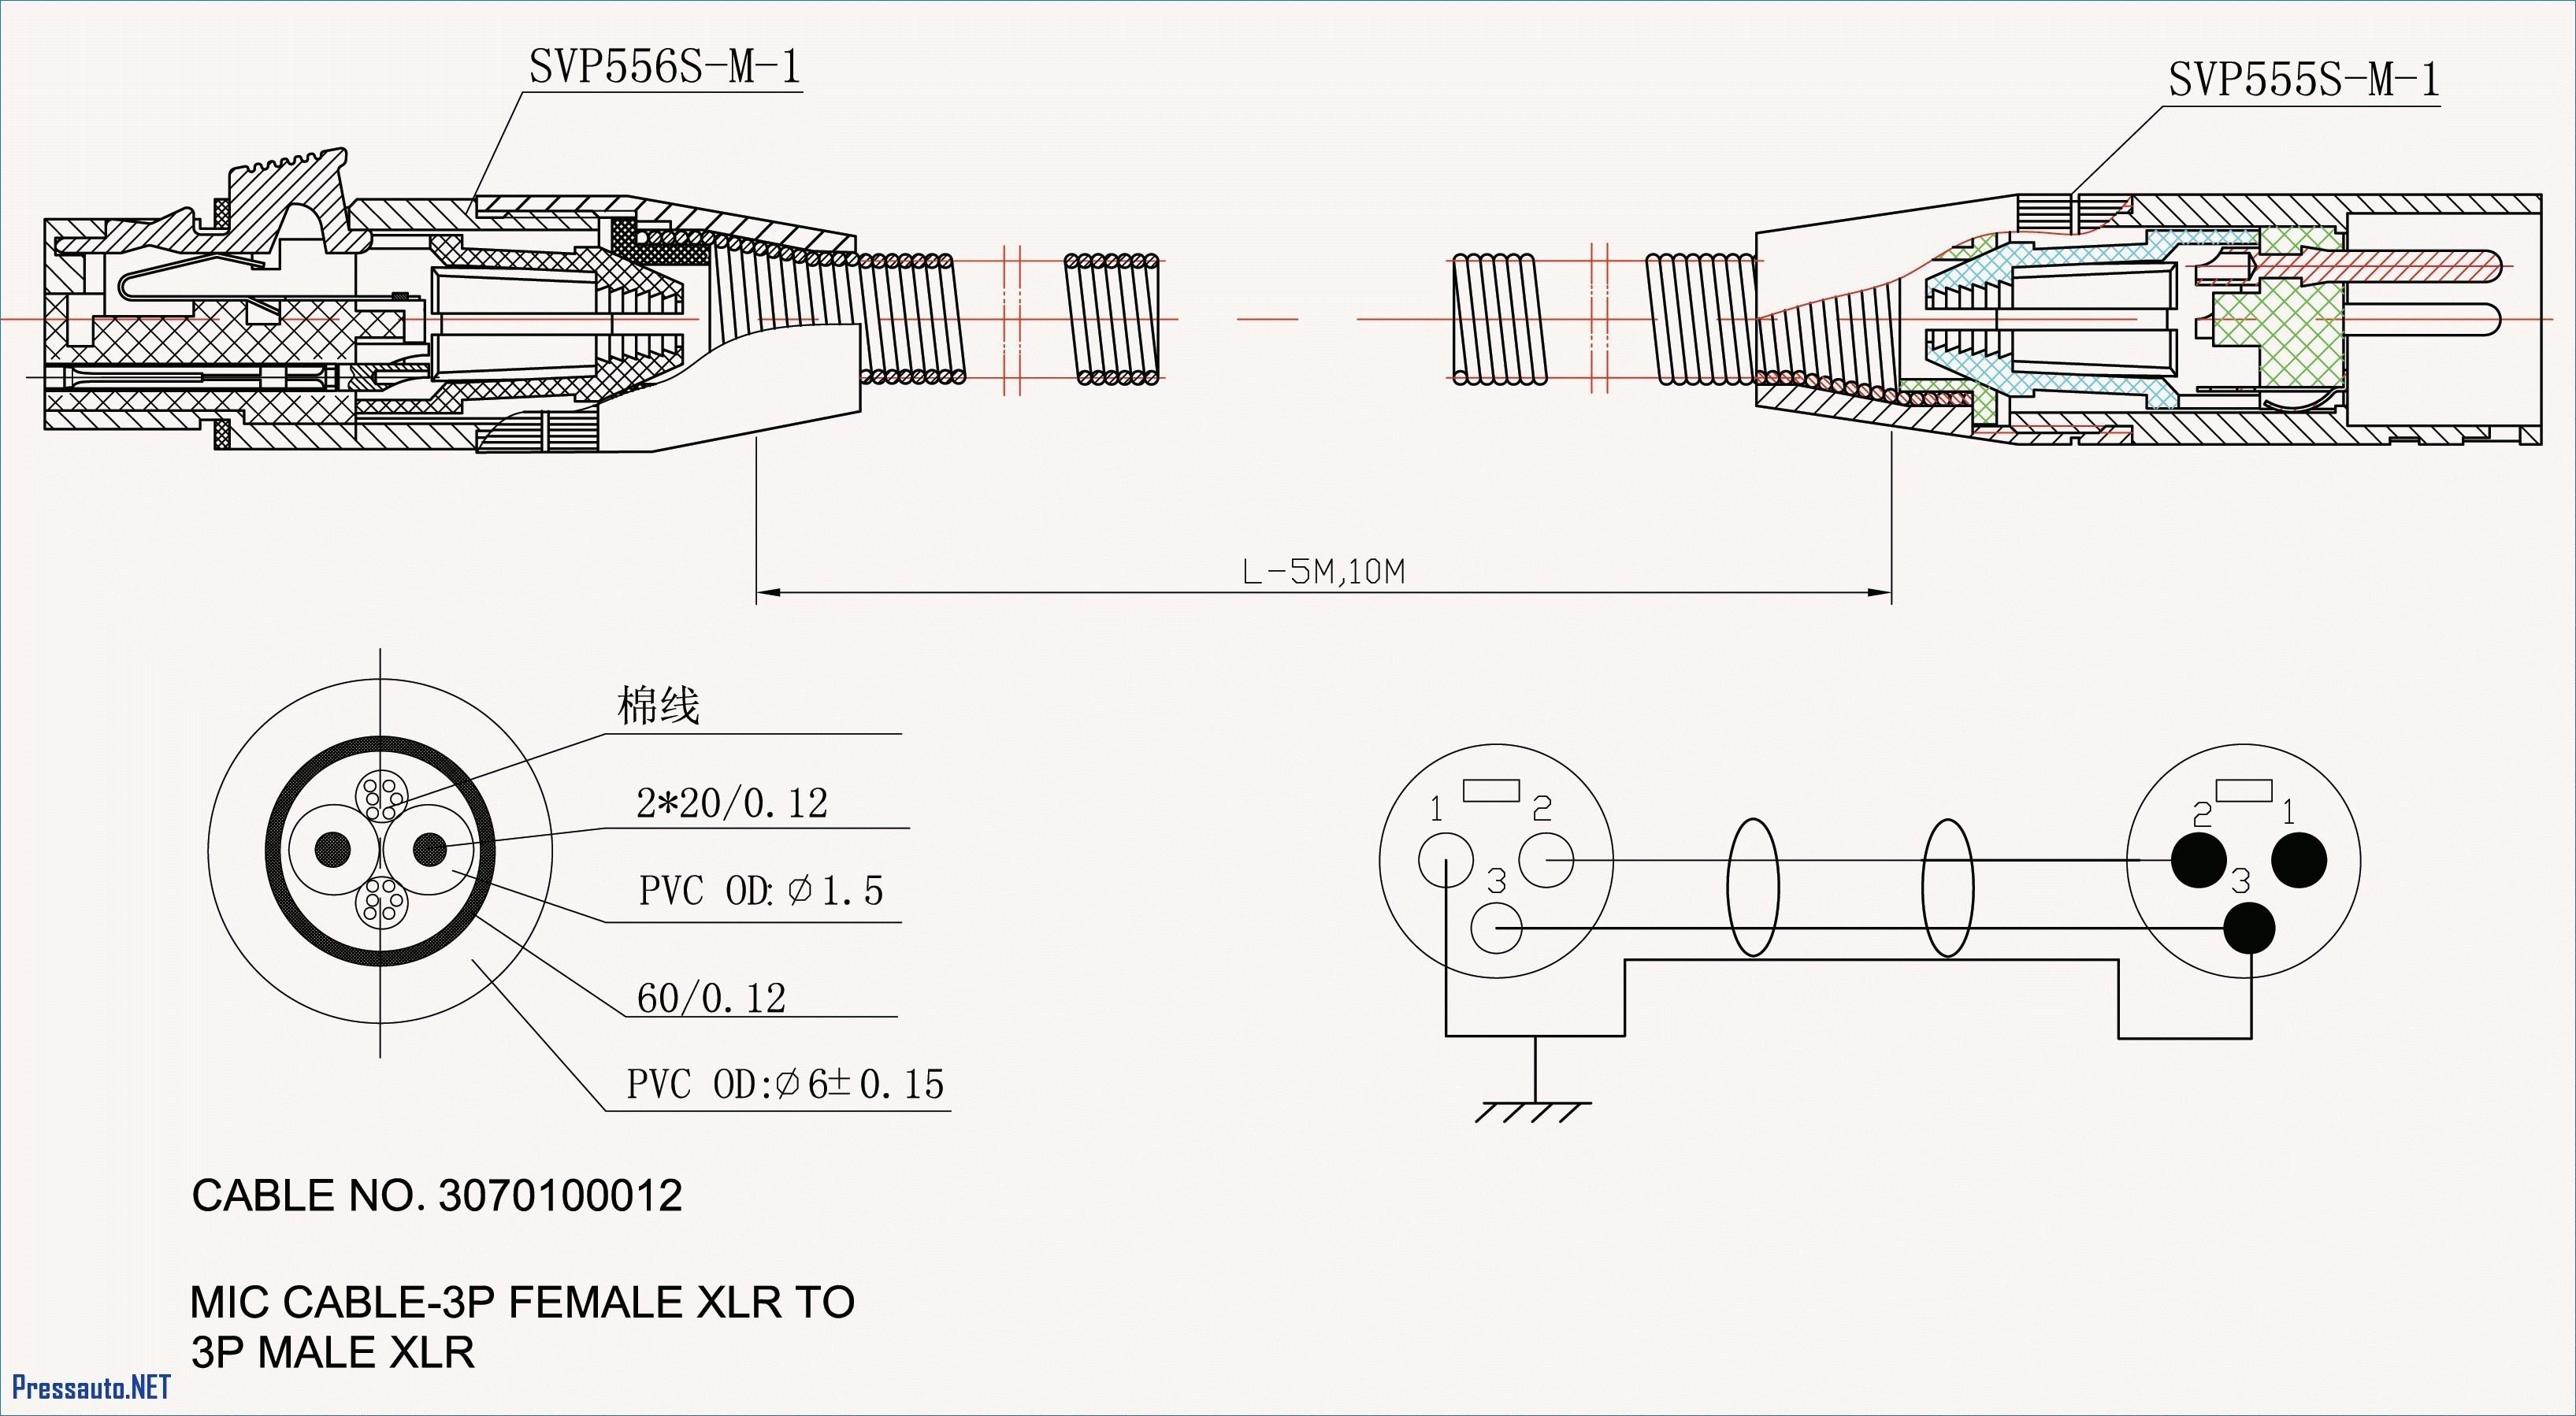 Golf Cart Turn Signal Wiring Diagram Bosch Starter Generator Wiring Diagram Experts Wiring Diagram • Of Golf Cart Turn Signal Wiring Diagram 1951 ford Brake Wiring Diagram Another Blog About Wiring Diagram •